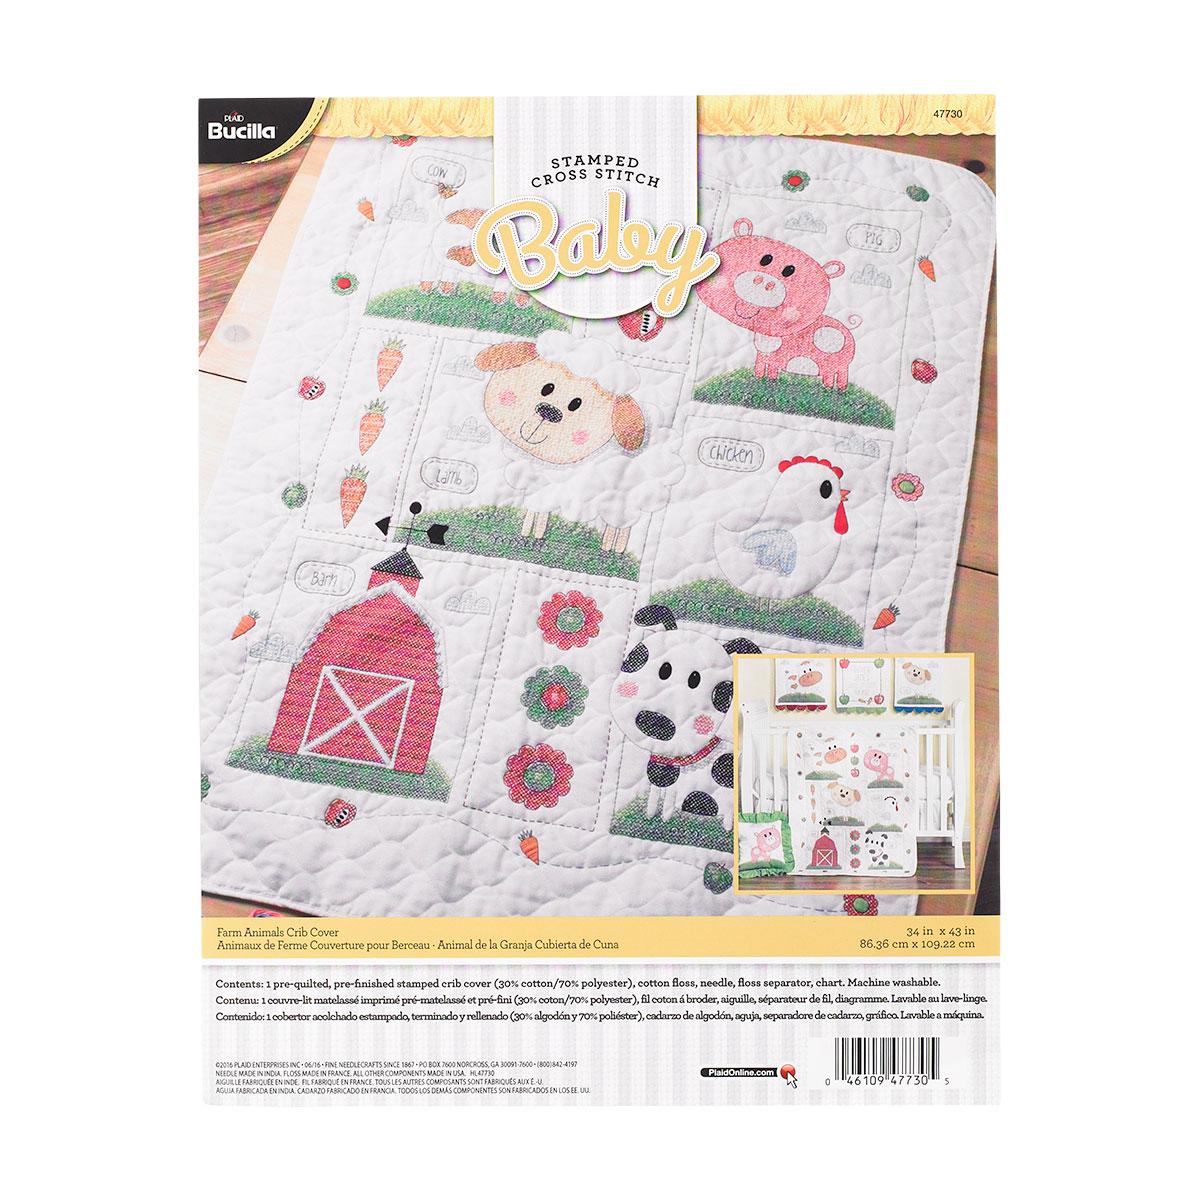 Bucilla ® Baby - Stamped Cross Stitch - Crib Ensembles - Farm Animals - Crib Cover